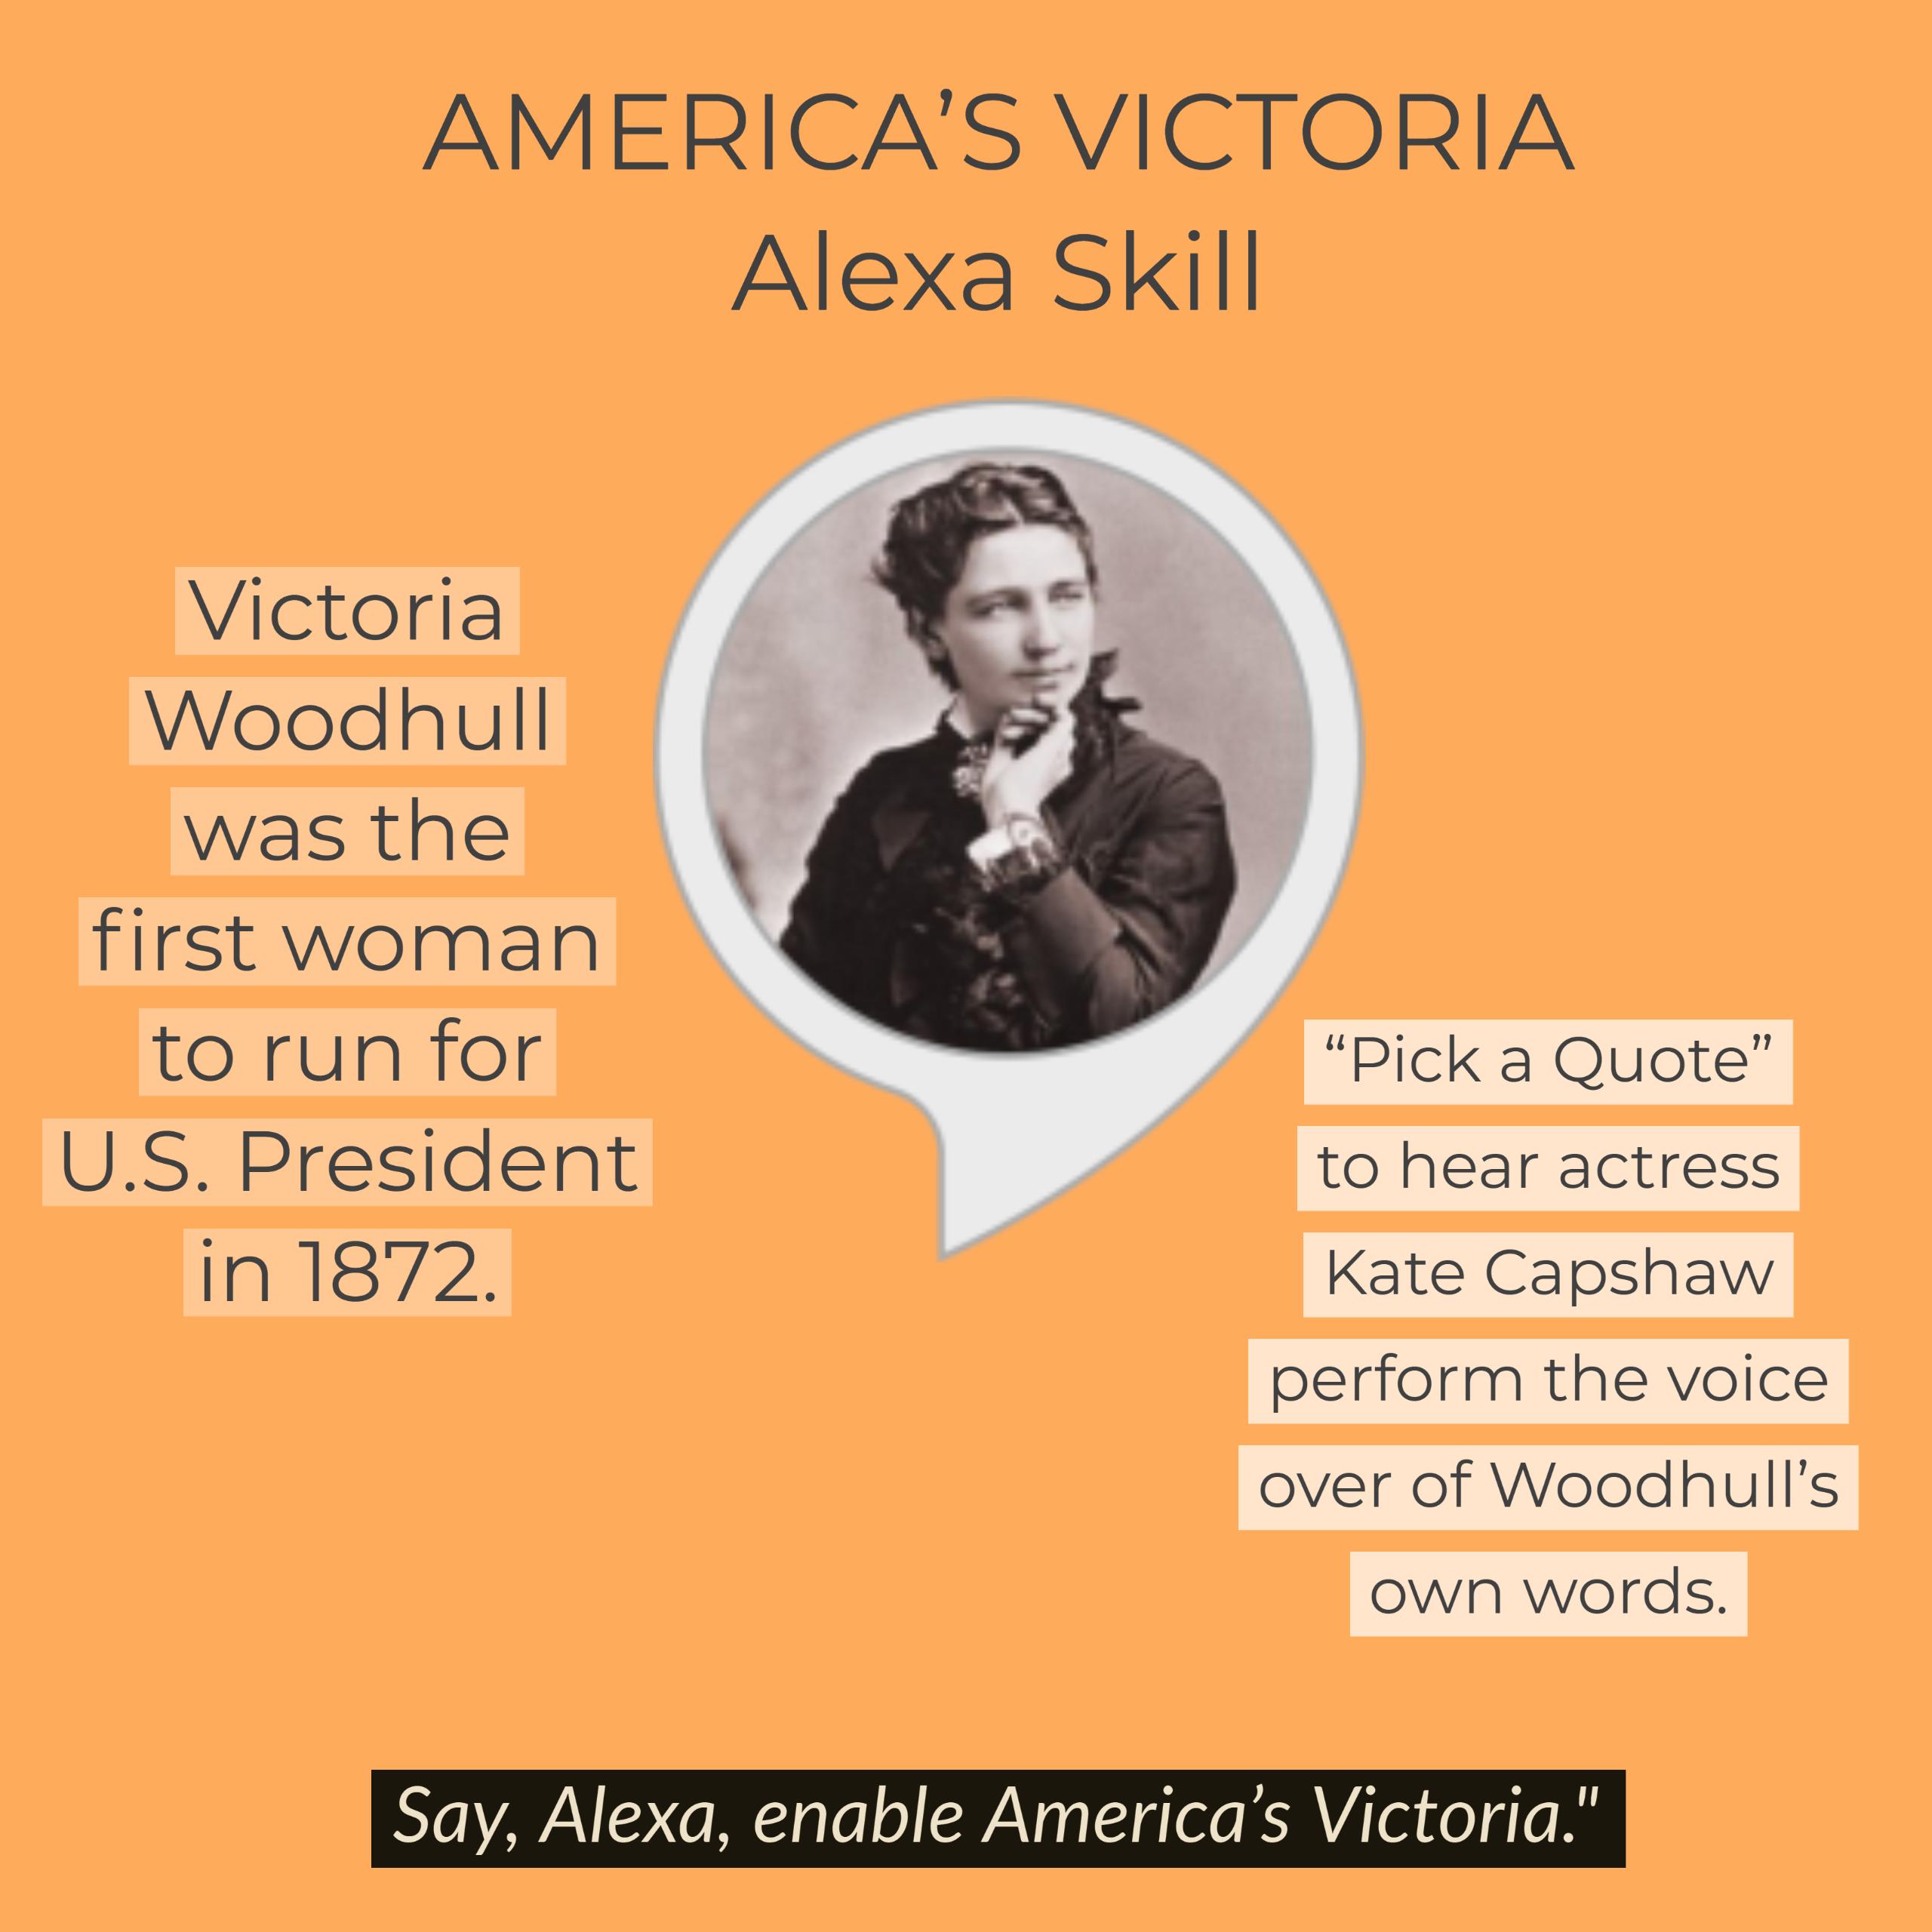 Victoria Woodhull Alexa Skill